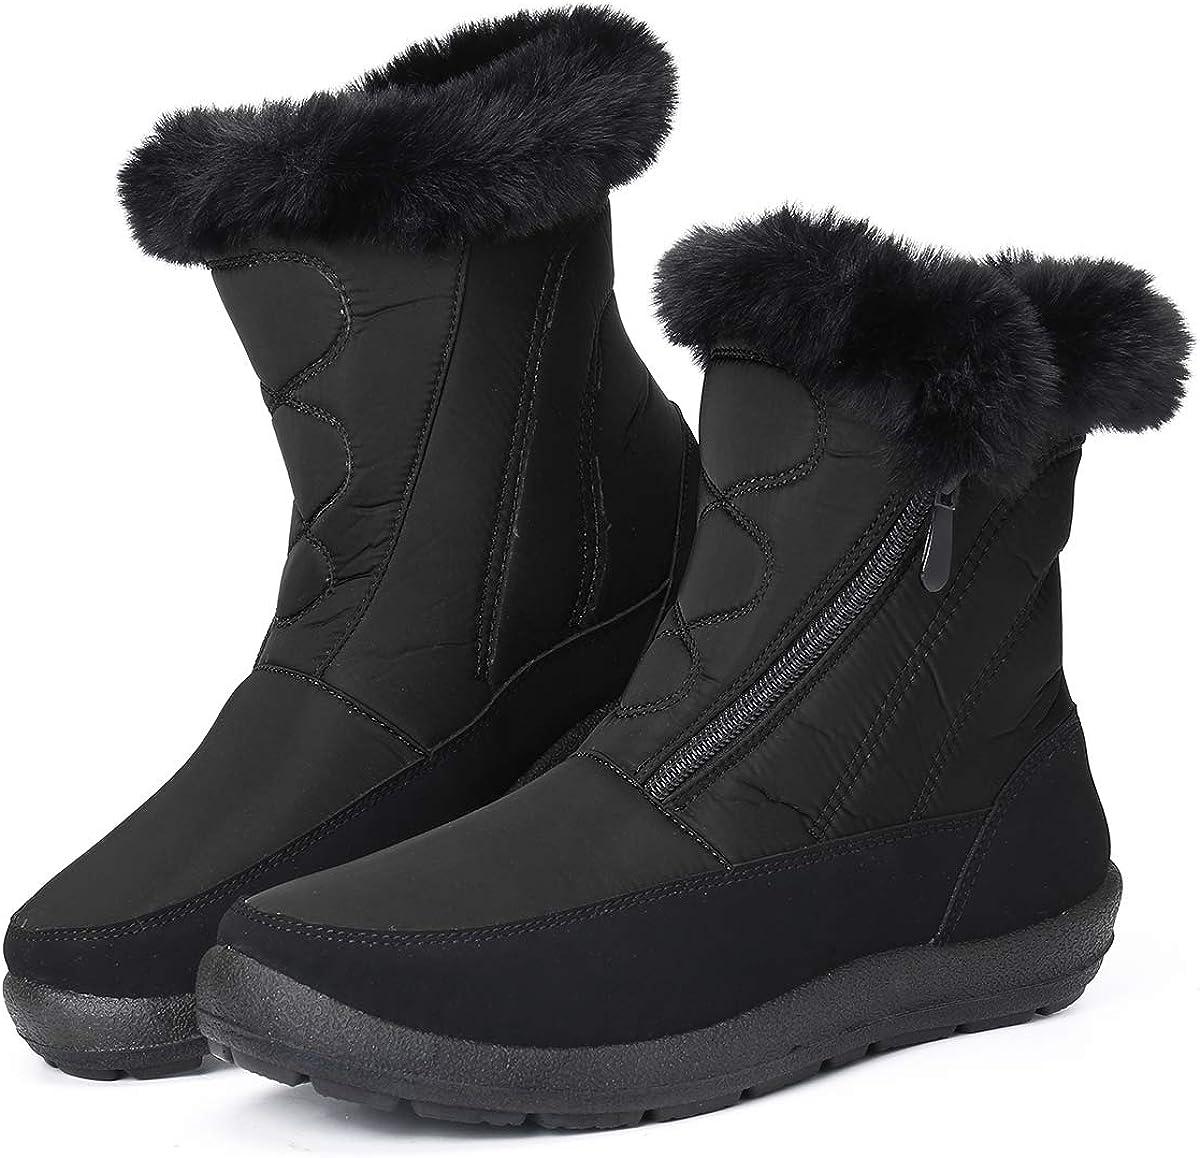 Zapatos de Invierno Botas de Lluvia de Piel Botas Impermeables Furty Rising Hot para Caminar Senderismo Camfosy Botas de Nieve para Mujer